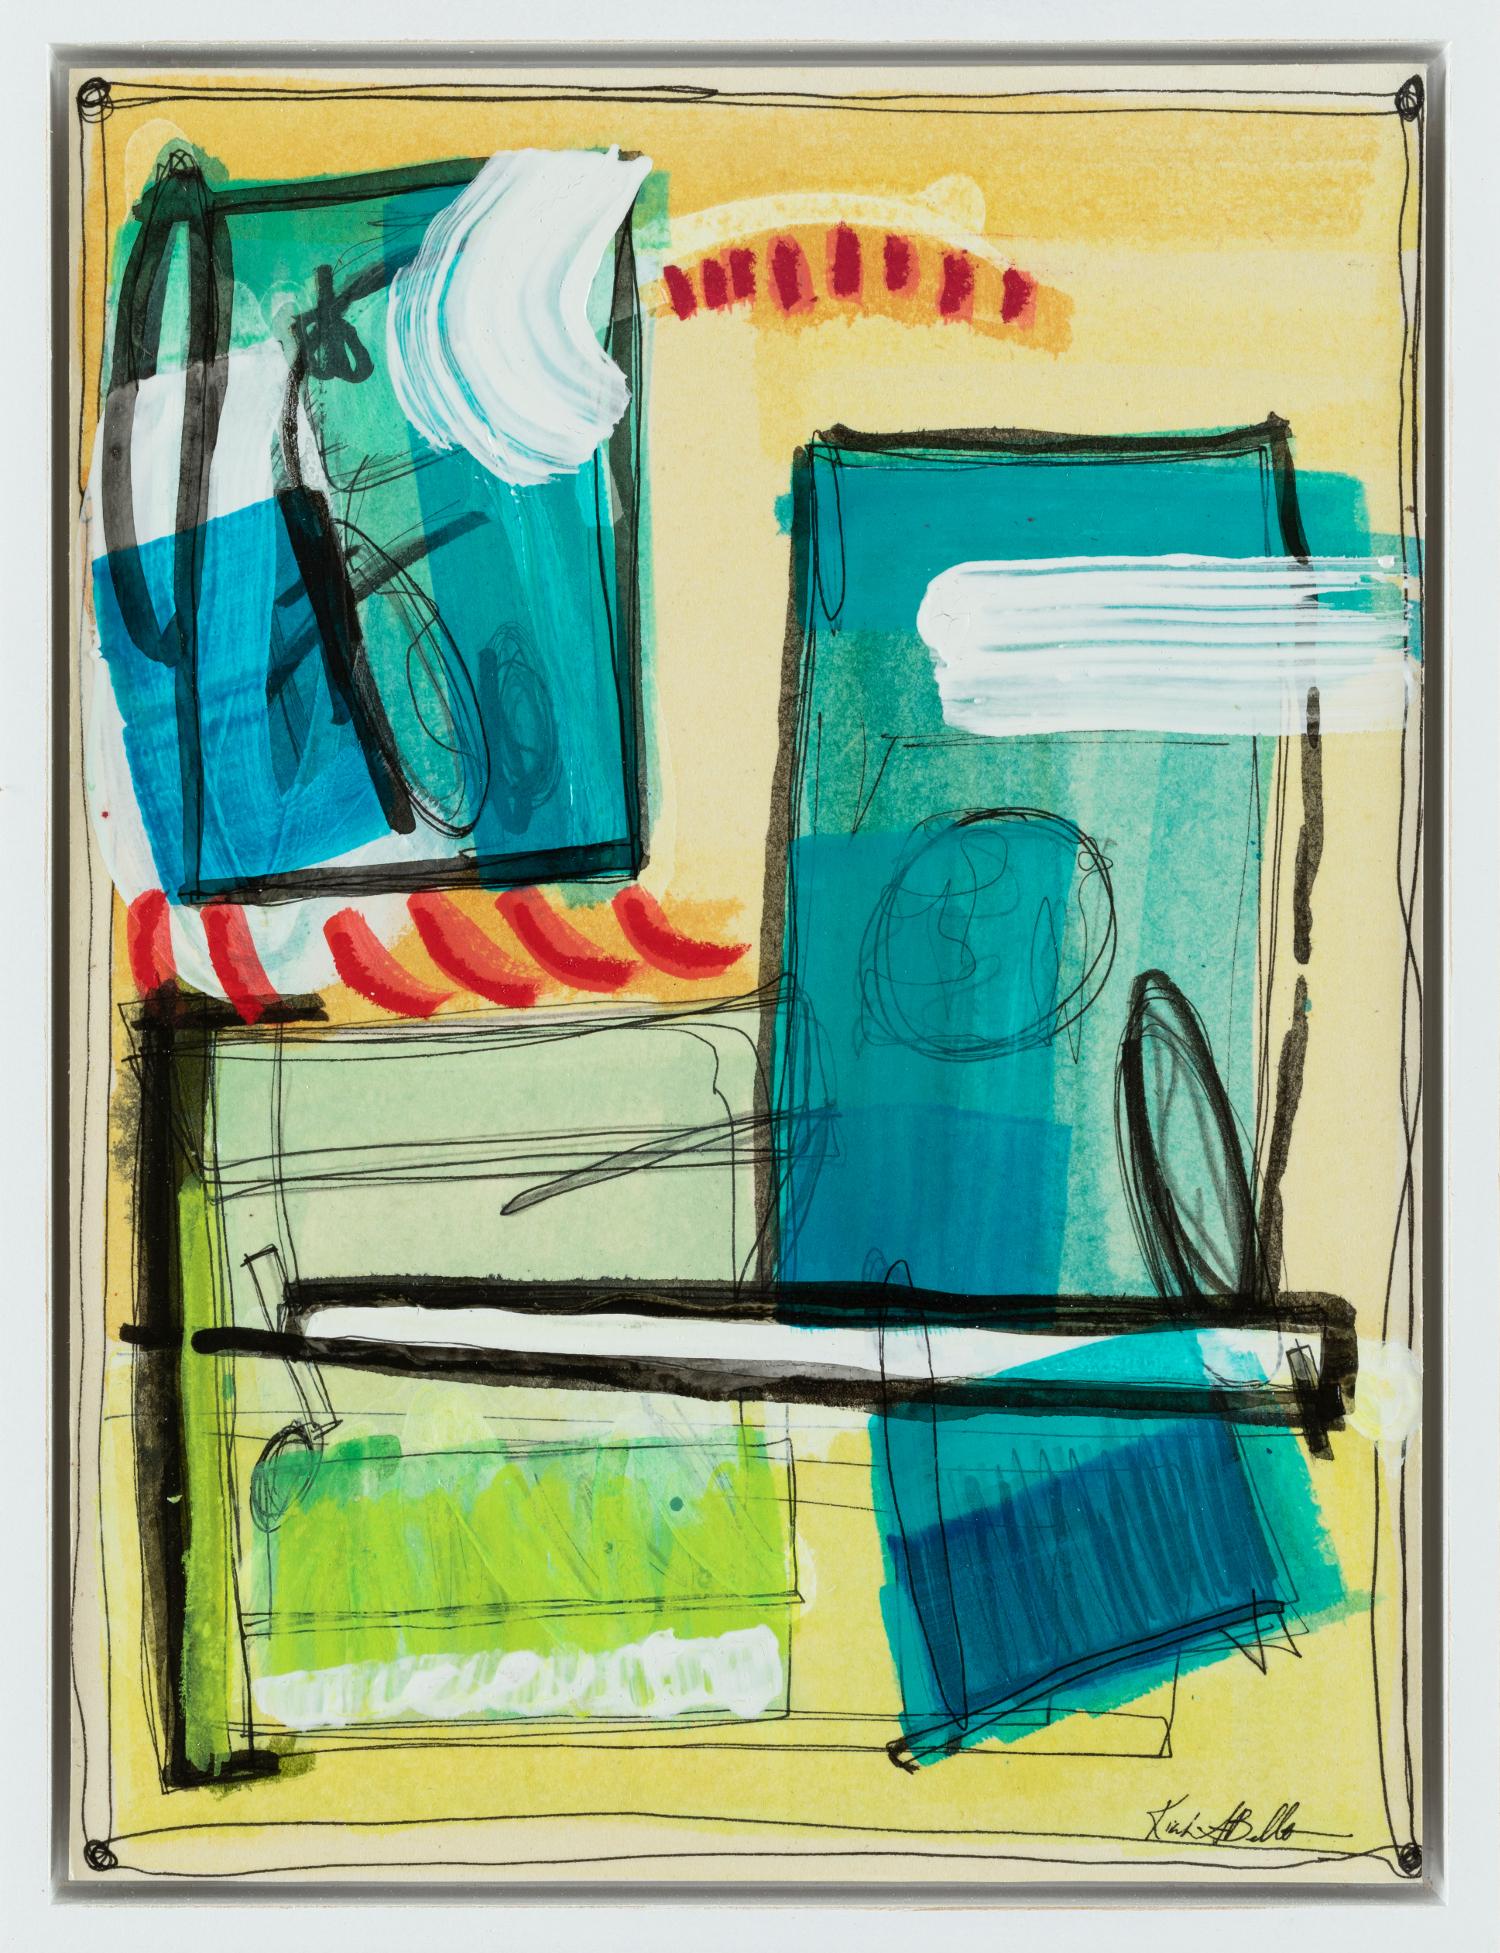 "Found Composition III - Kiah Bellows10"" x 13""Mixed media on board, framed$225"